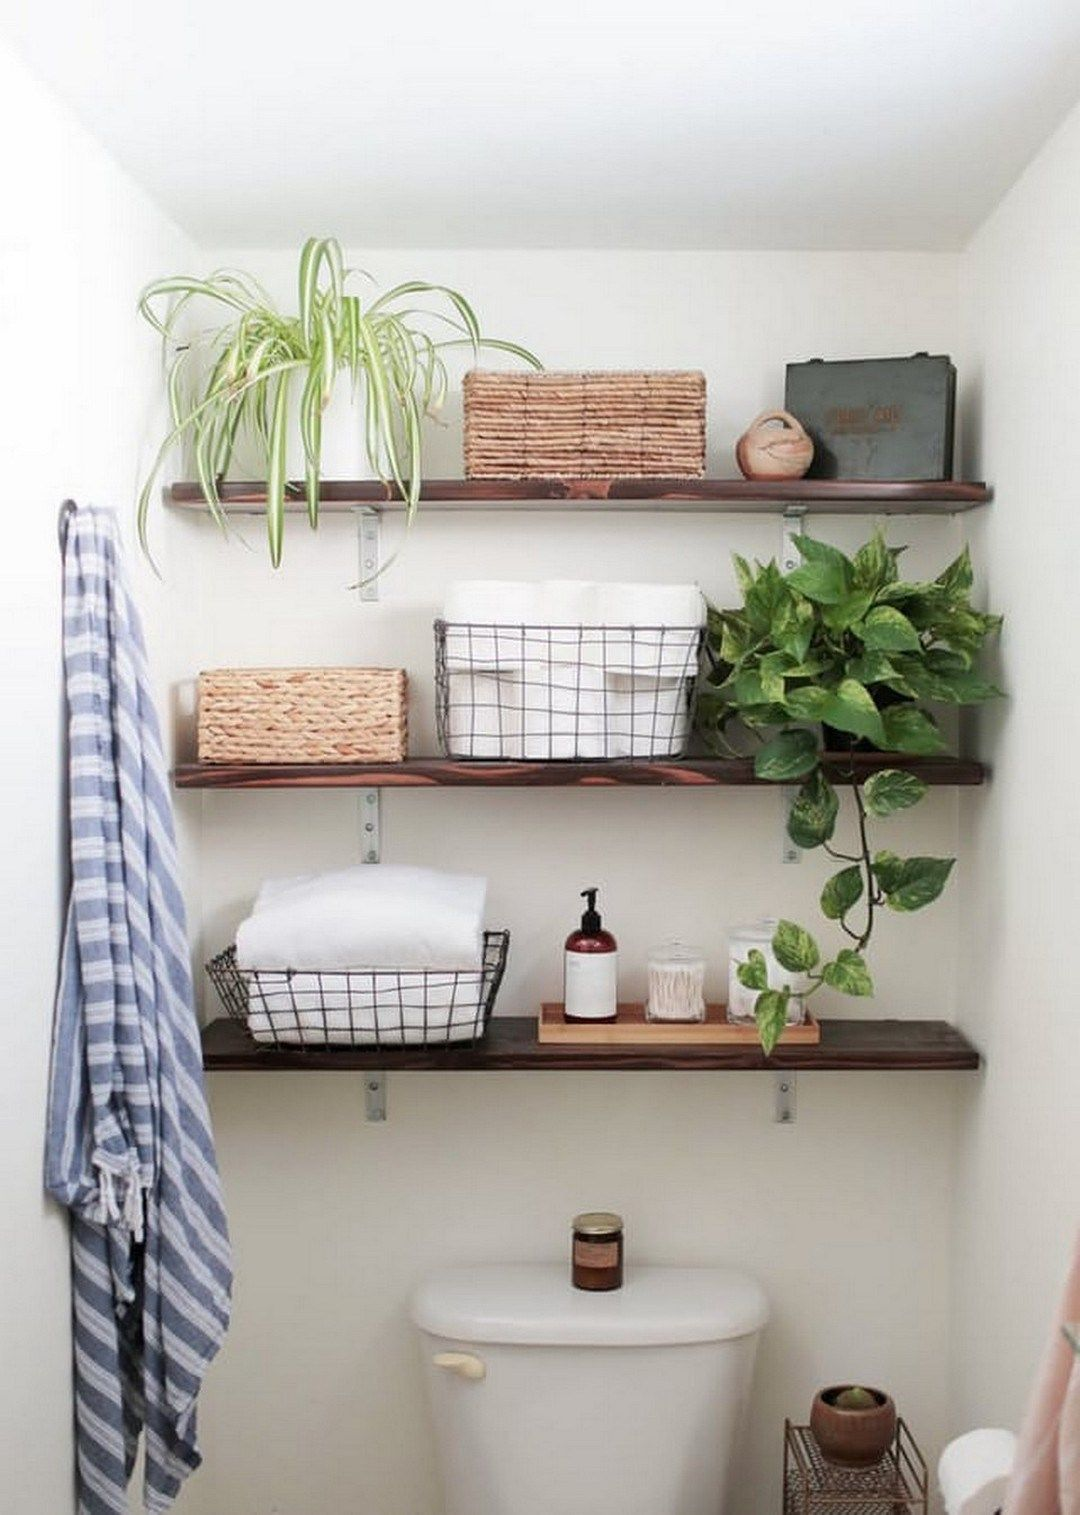 Badezimmerdesign bangladesch  diy small apartement decorating ideas   bathroom  pinterest